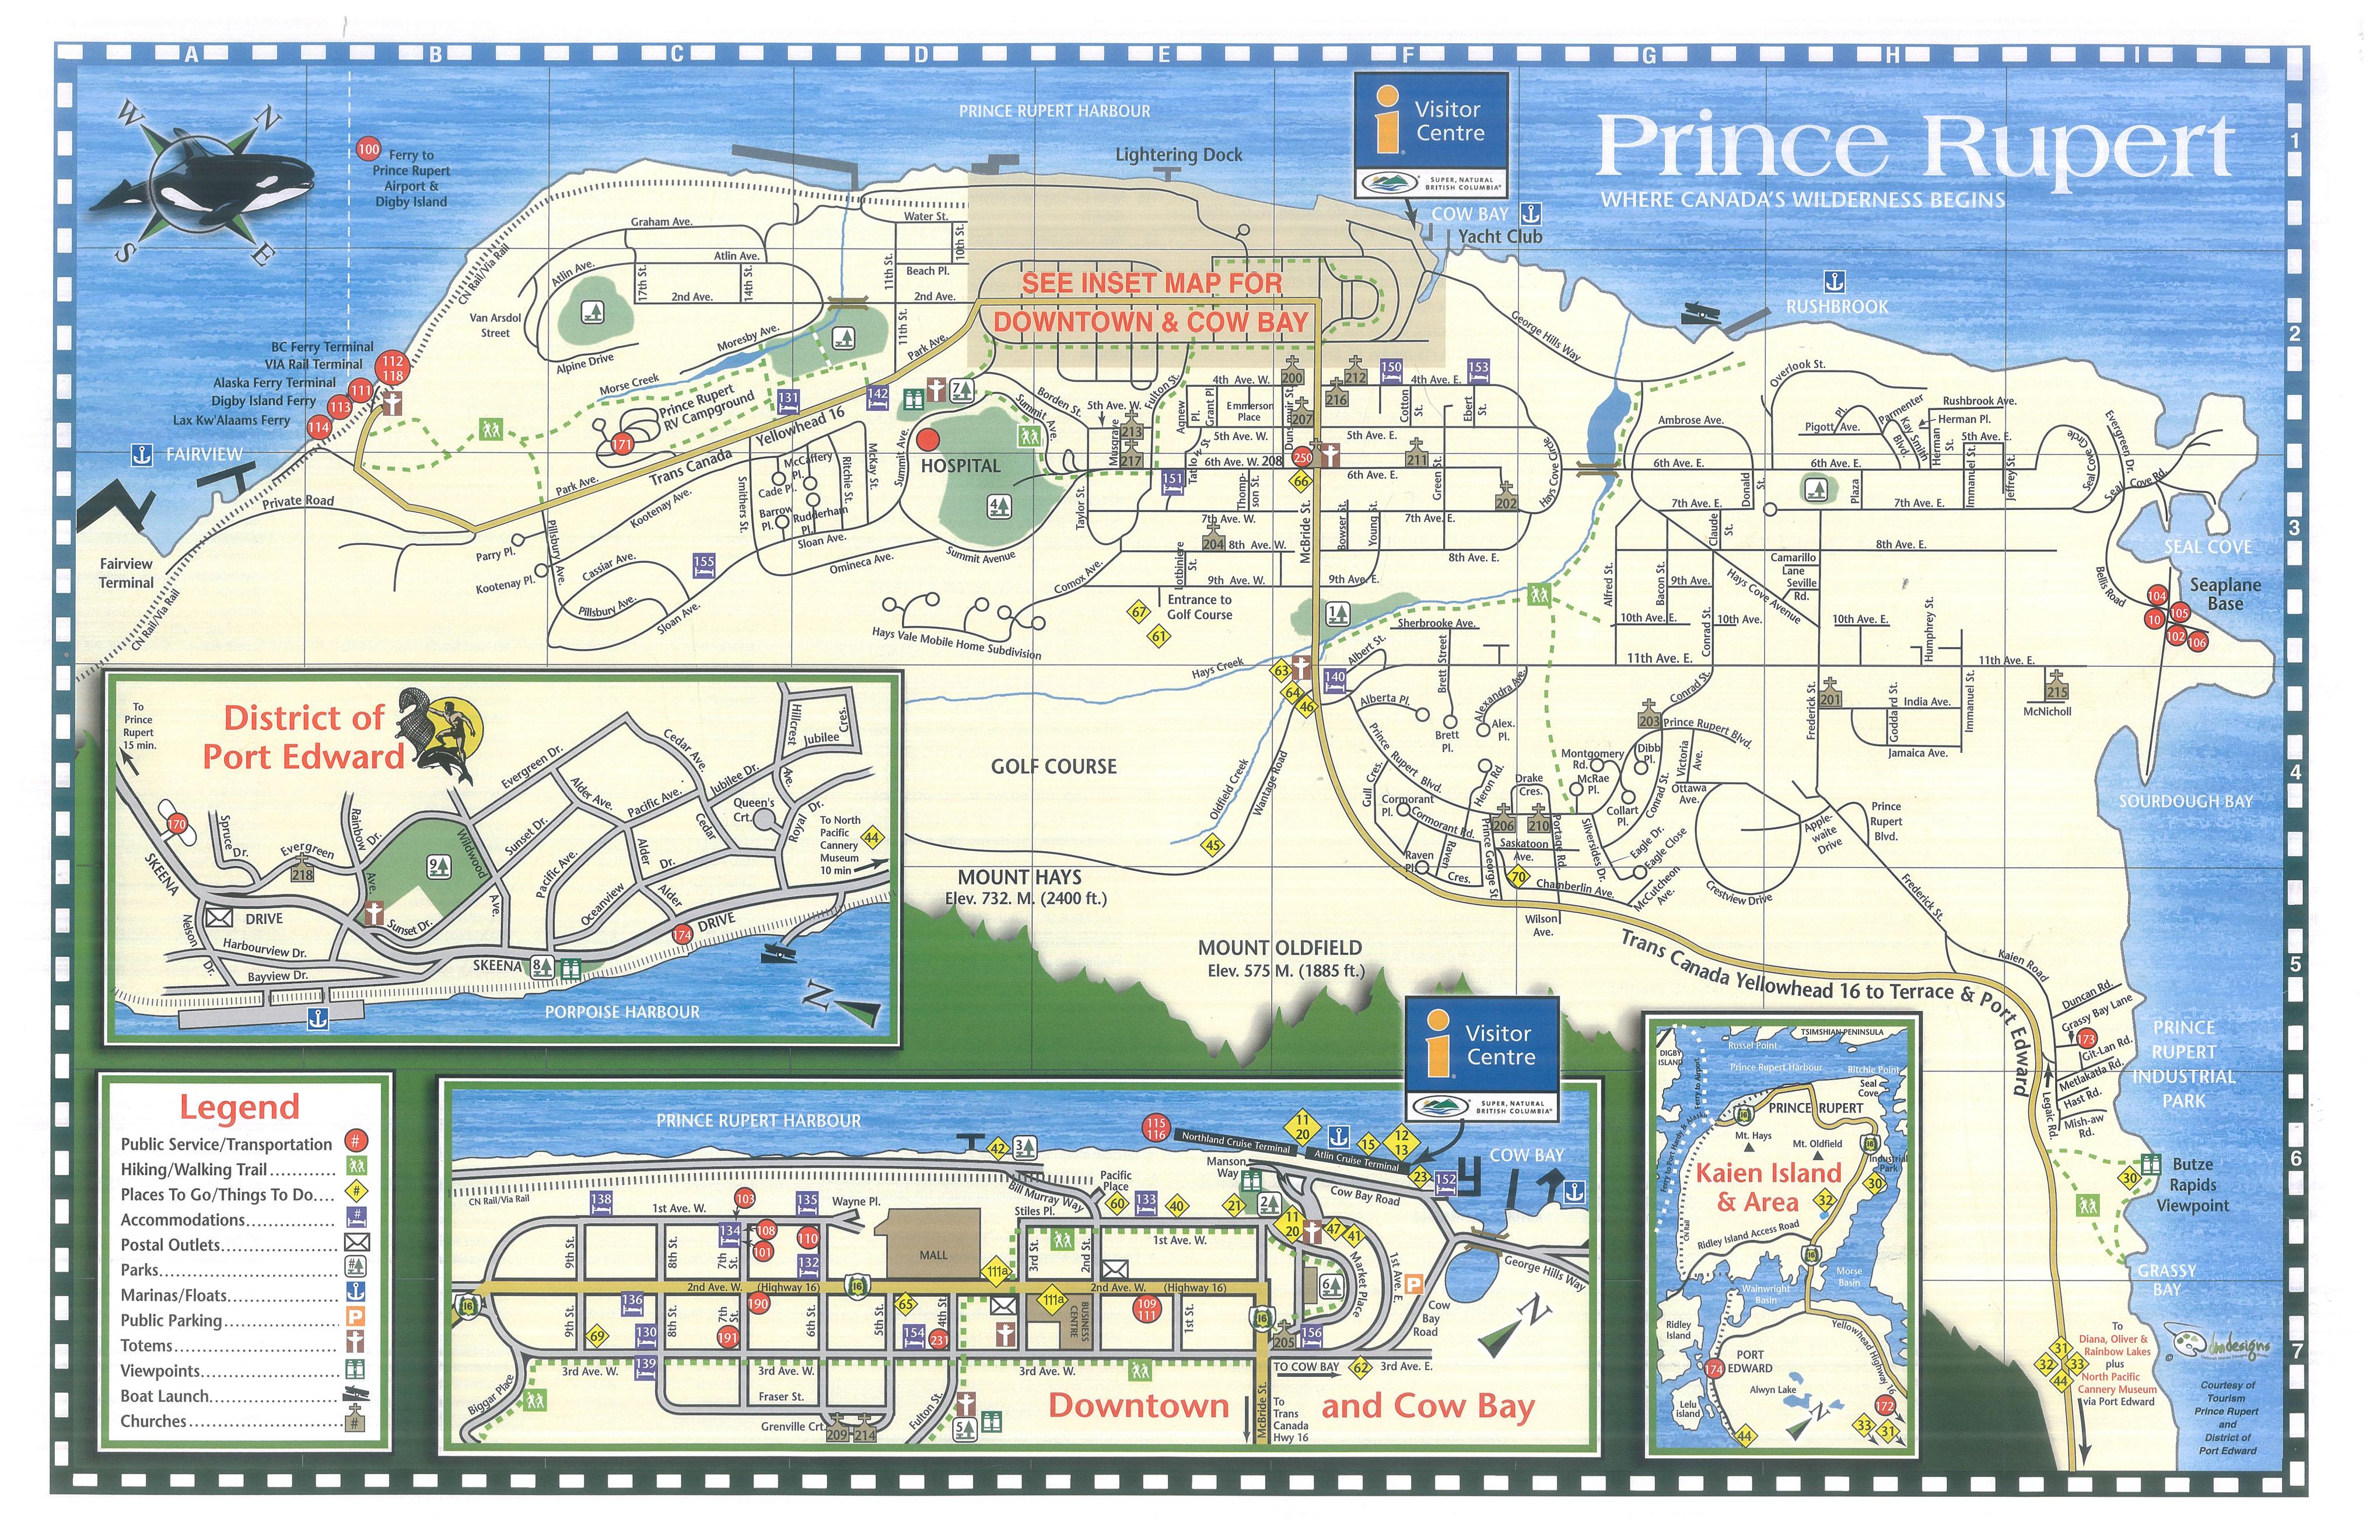 Prince Rupert Map Prince Rupert mayor touts economic opportunities   KRBD Prince Rupert Map